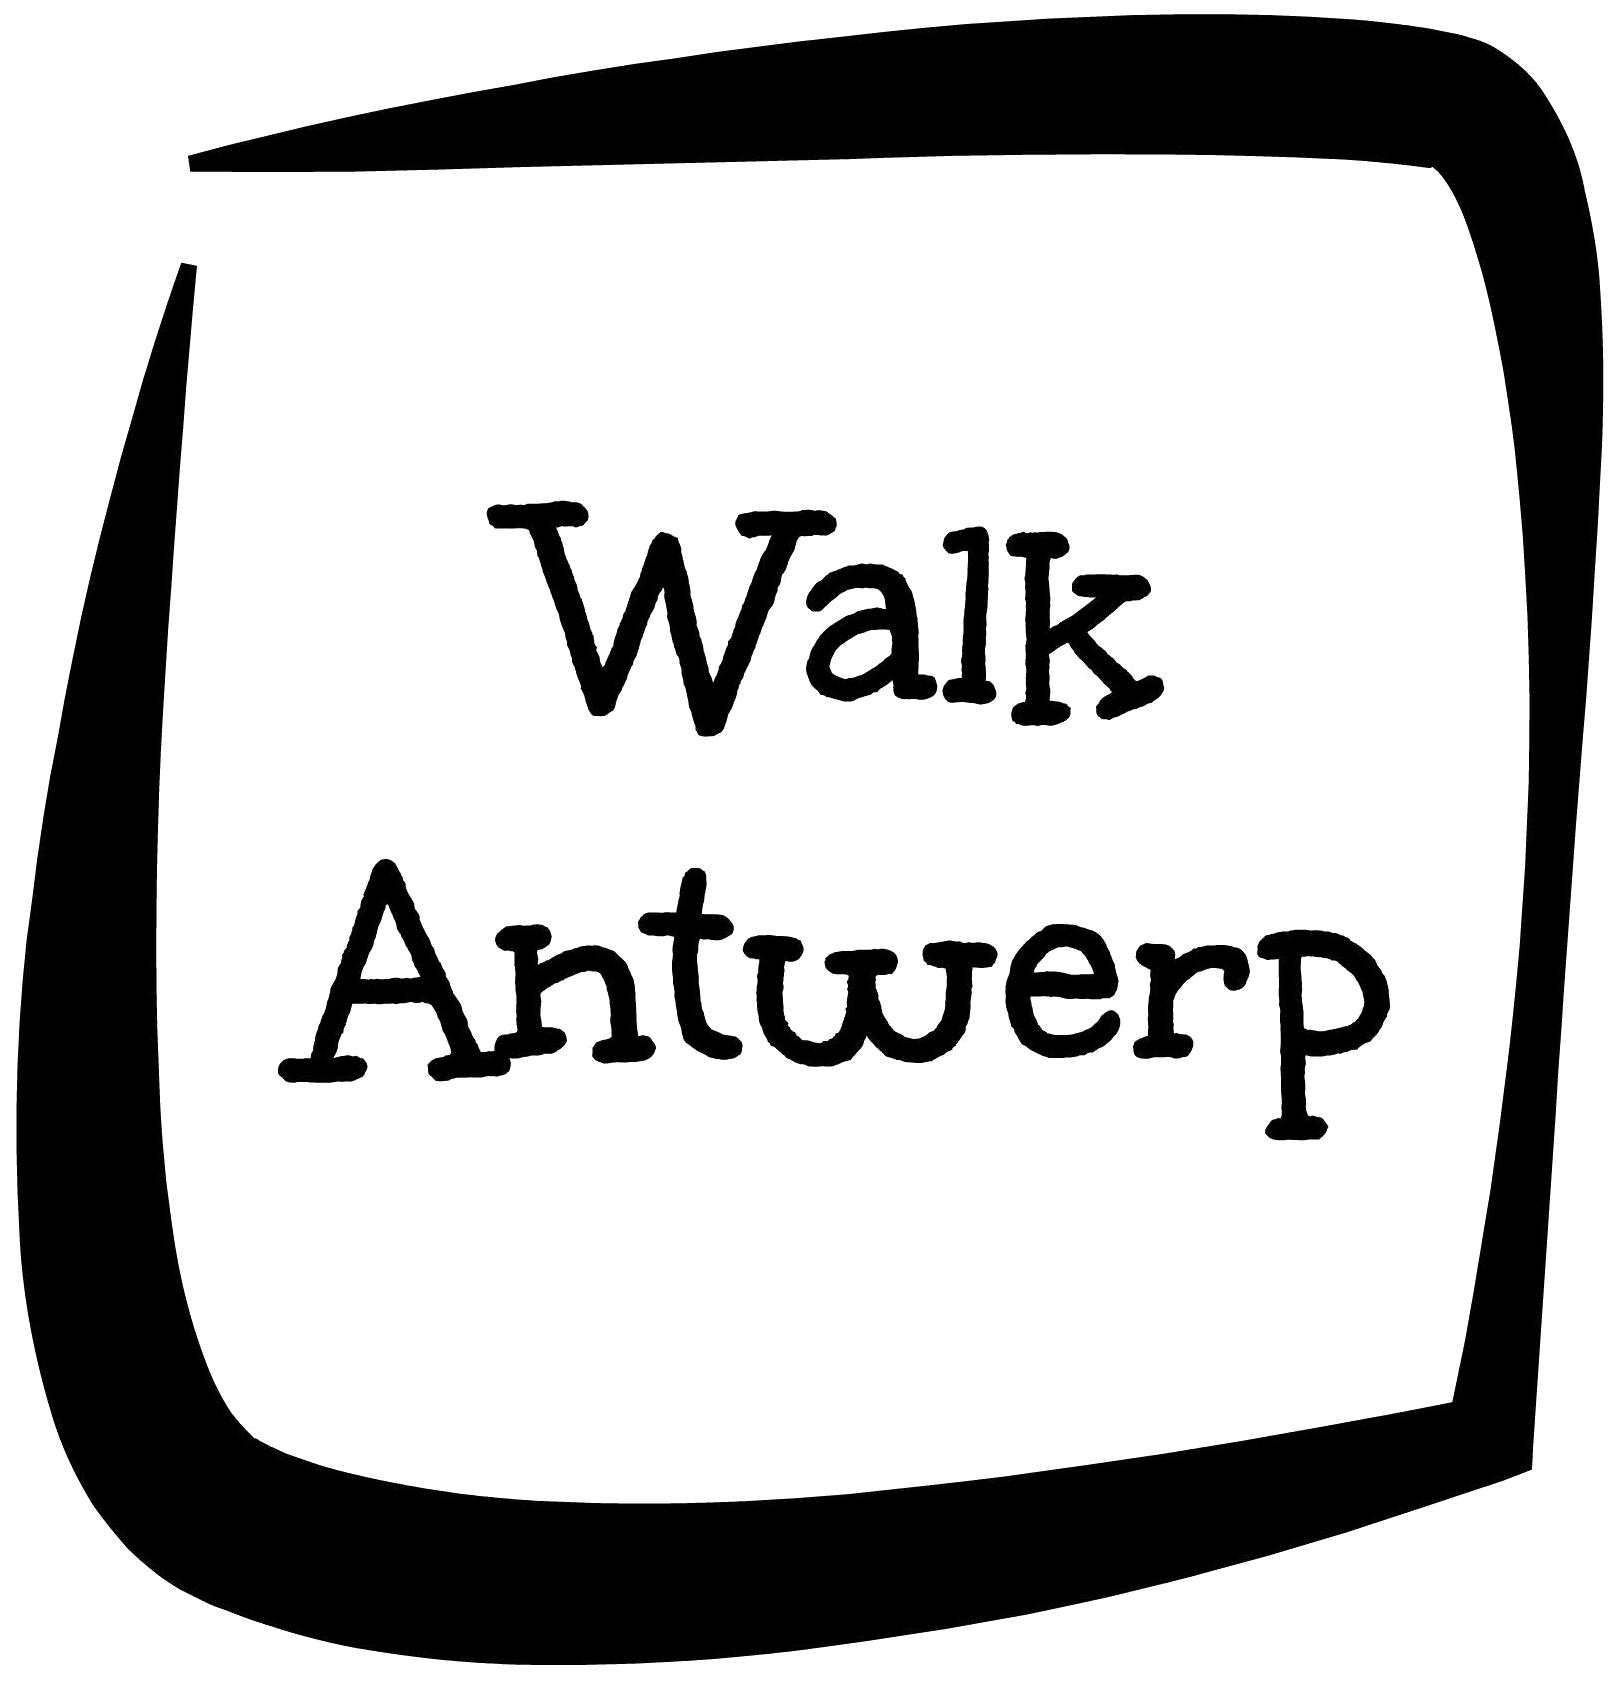 Walk Antwerp